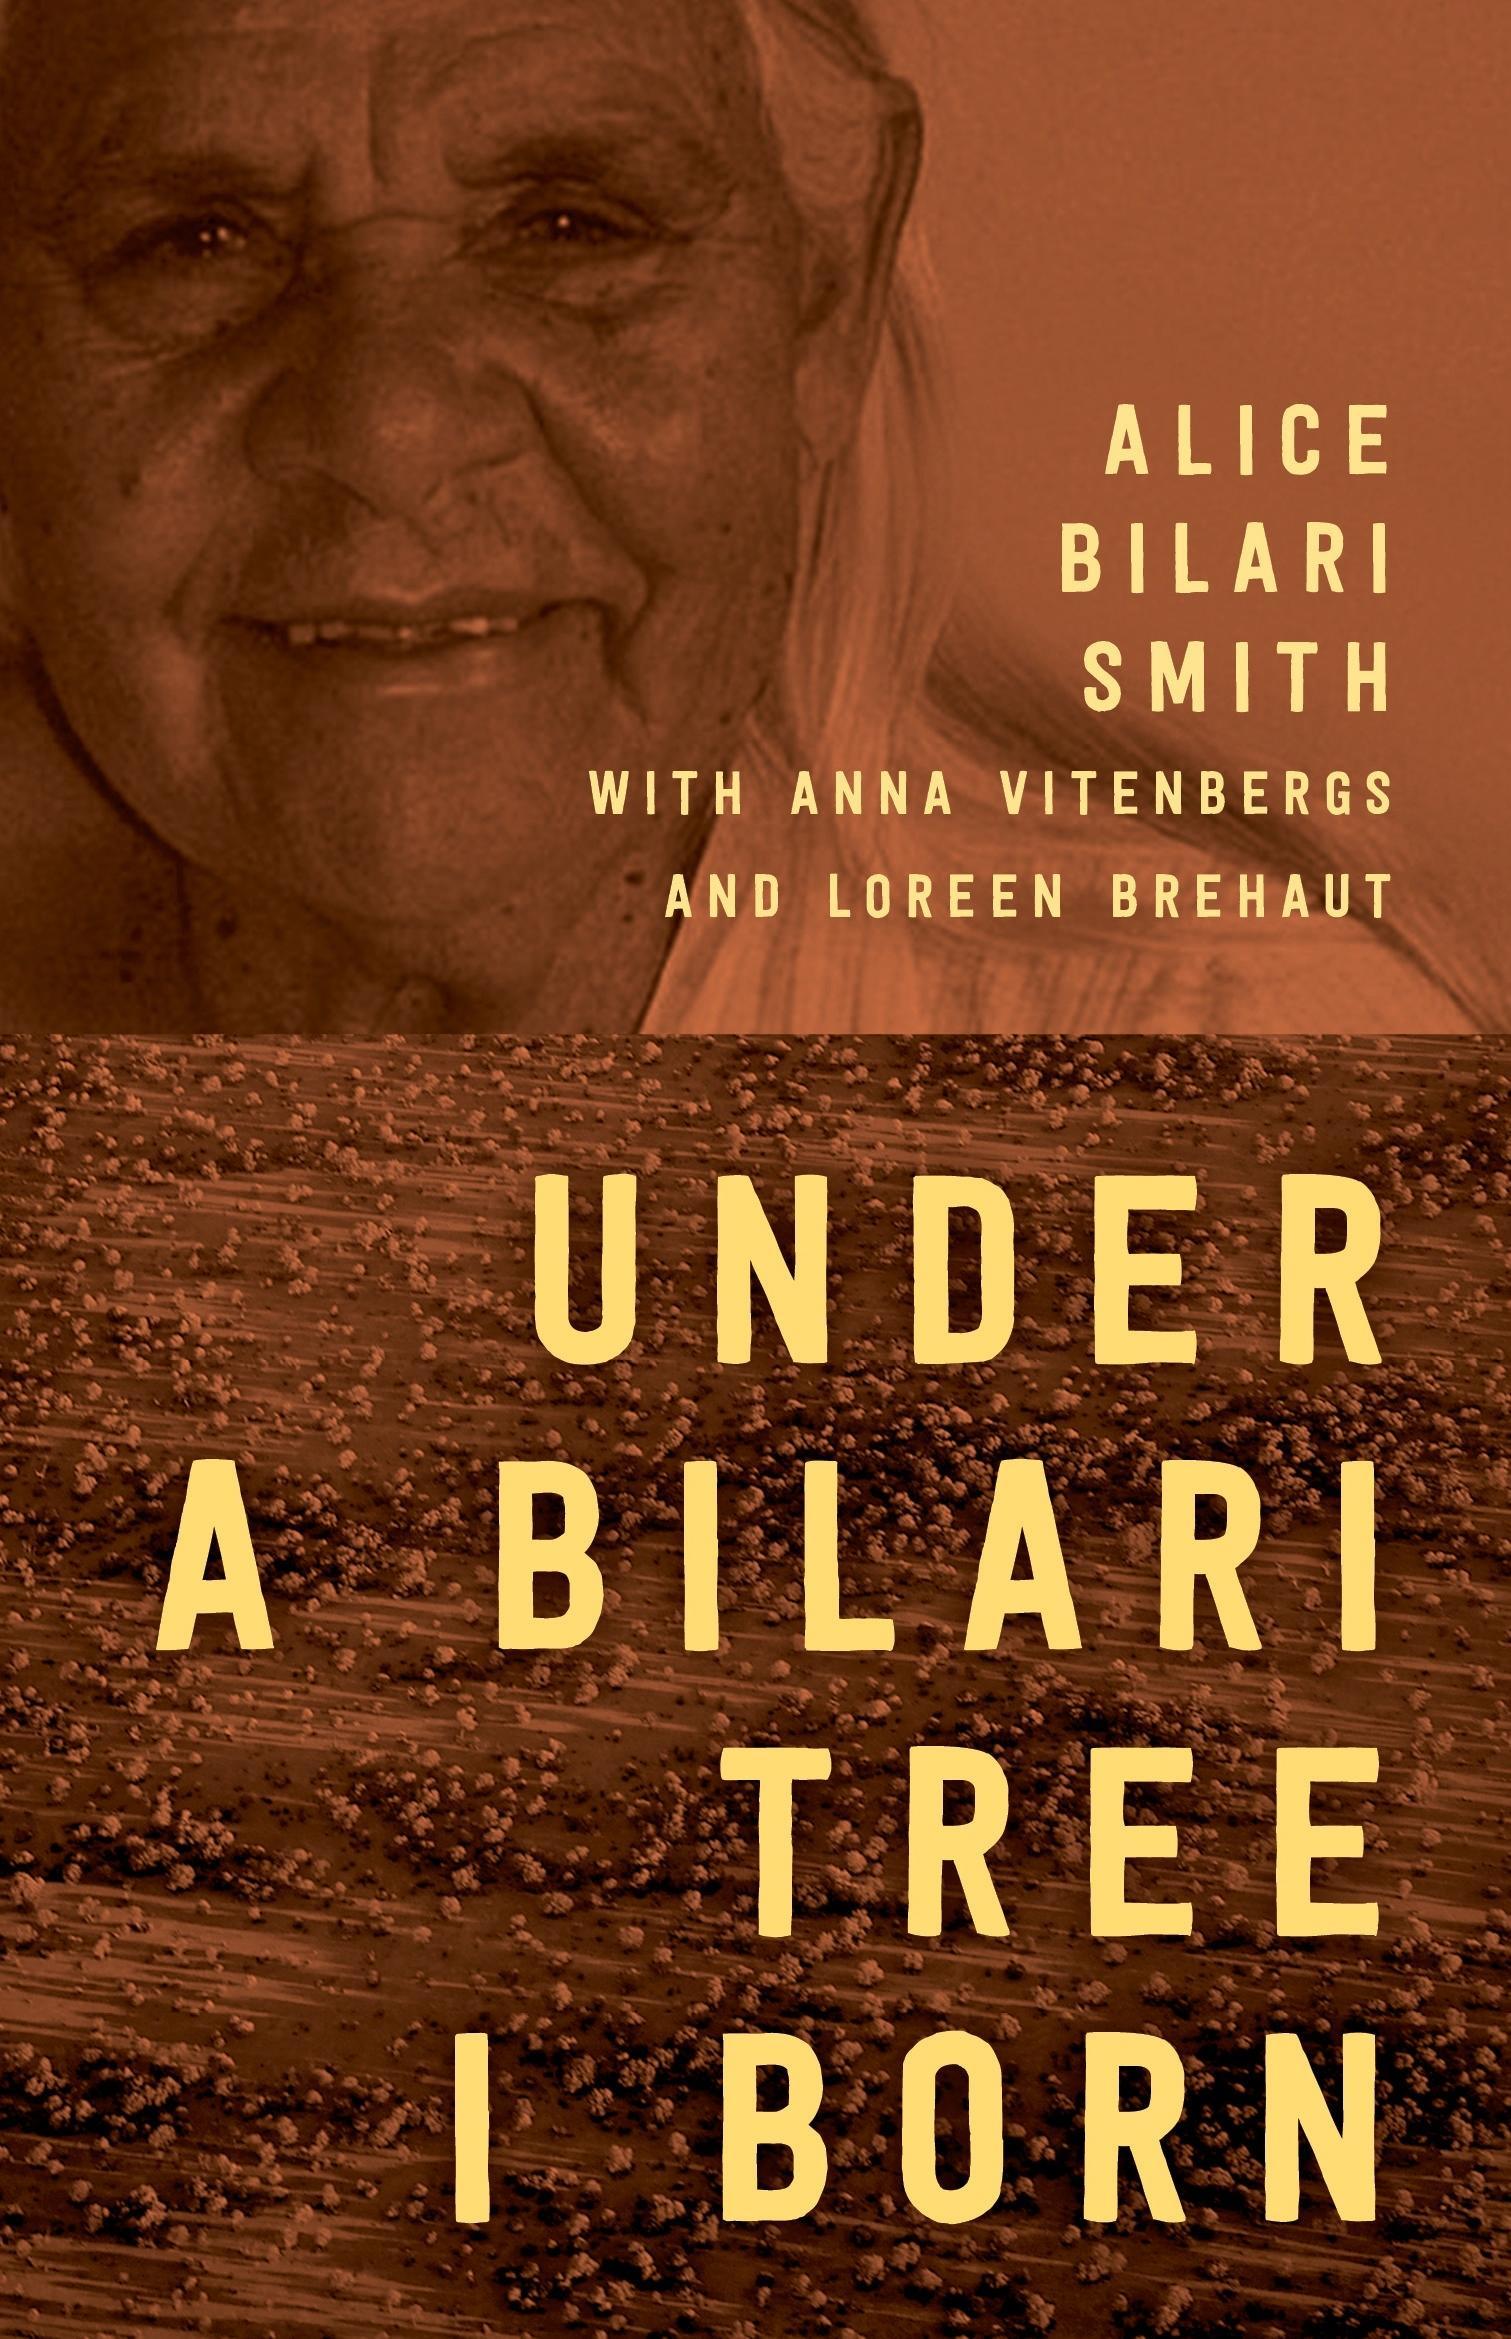 Under a Bilari TreeIBorn